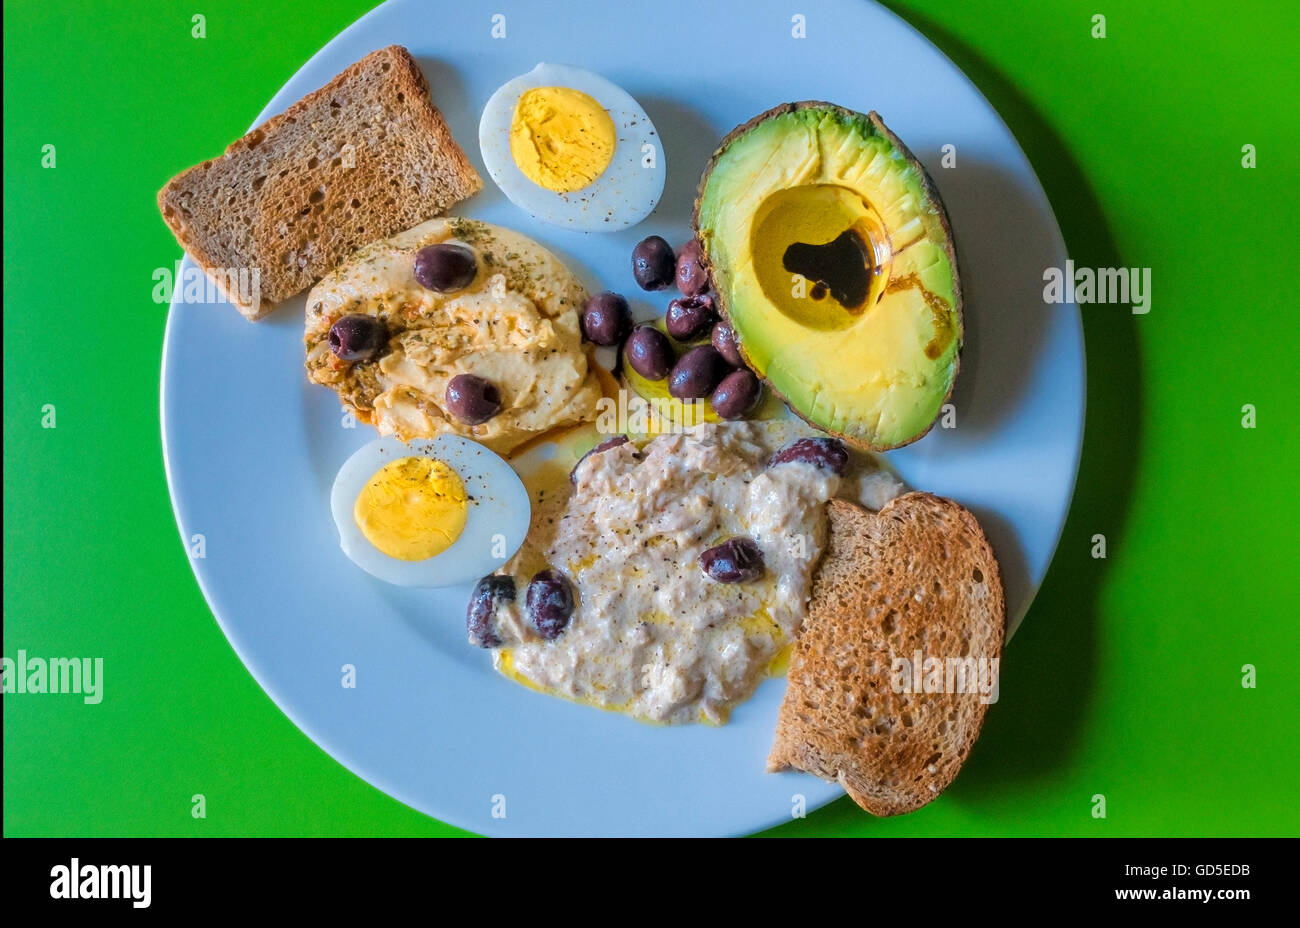 Cold food: hard-boiled egg, humus, tuna salad, olives, whole wheat toast - Stock Image